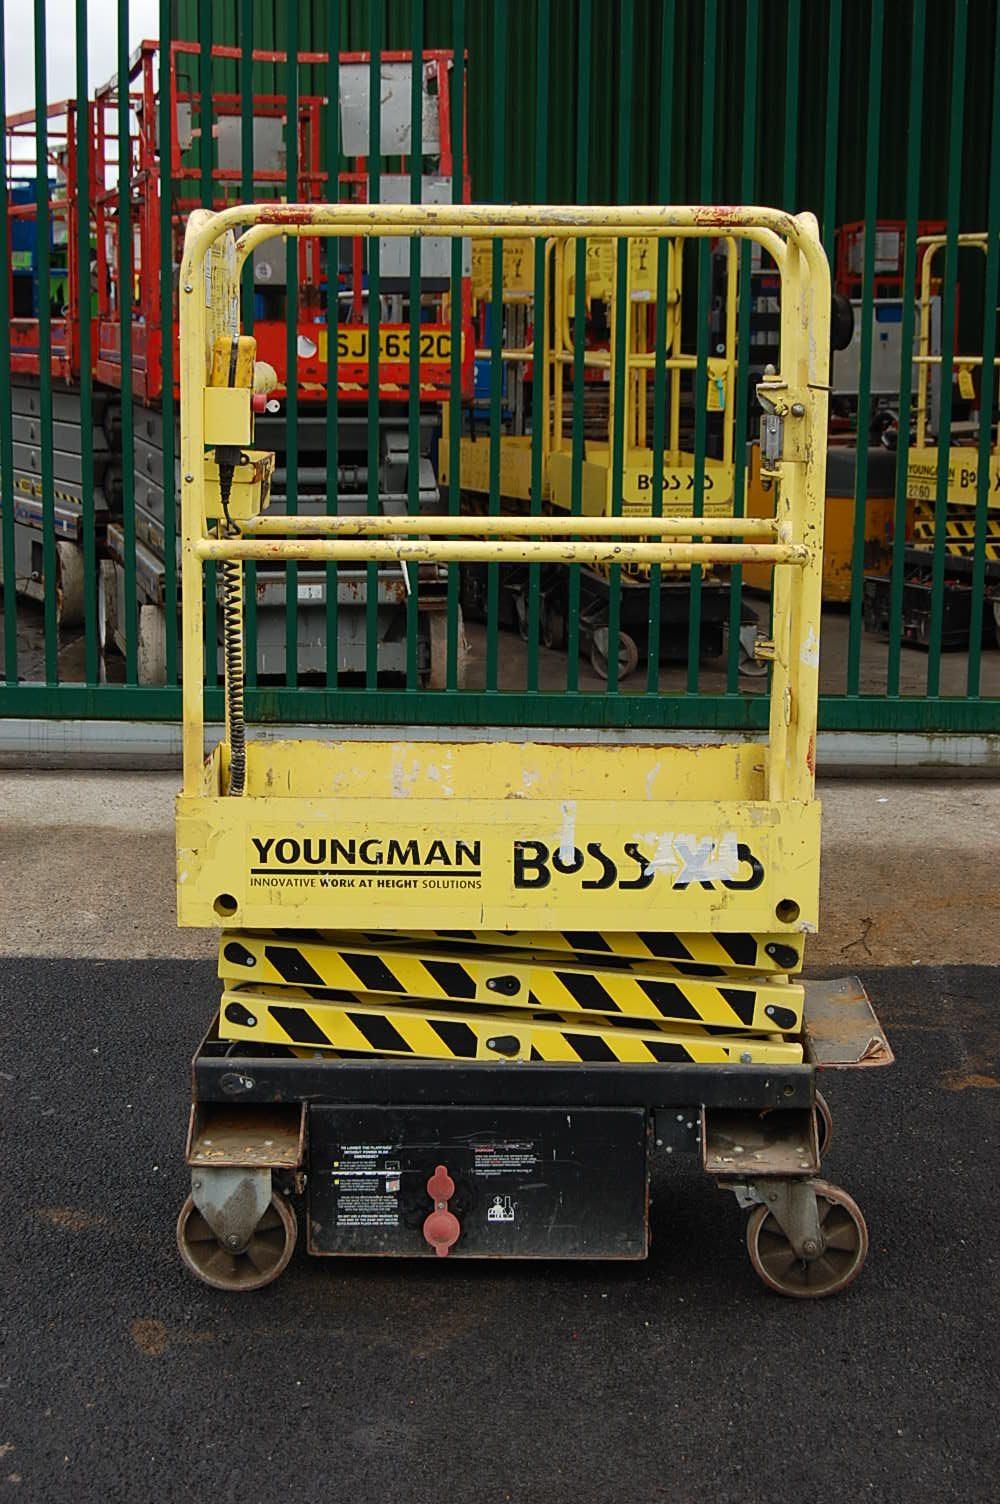 Youngman Boss X3 Micro Powered Access Platform